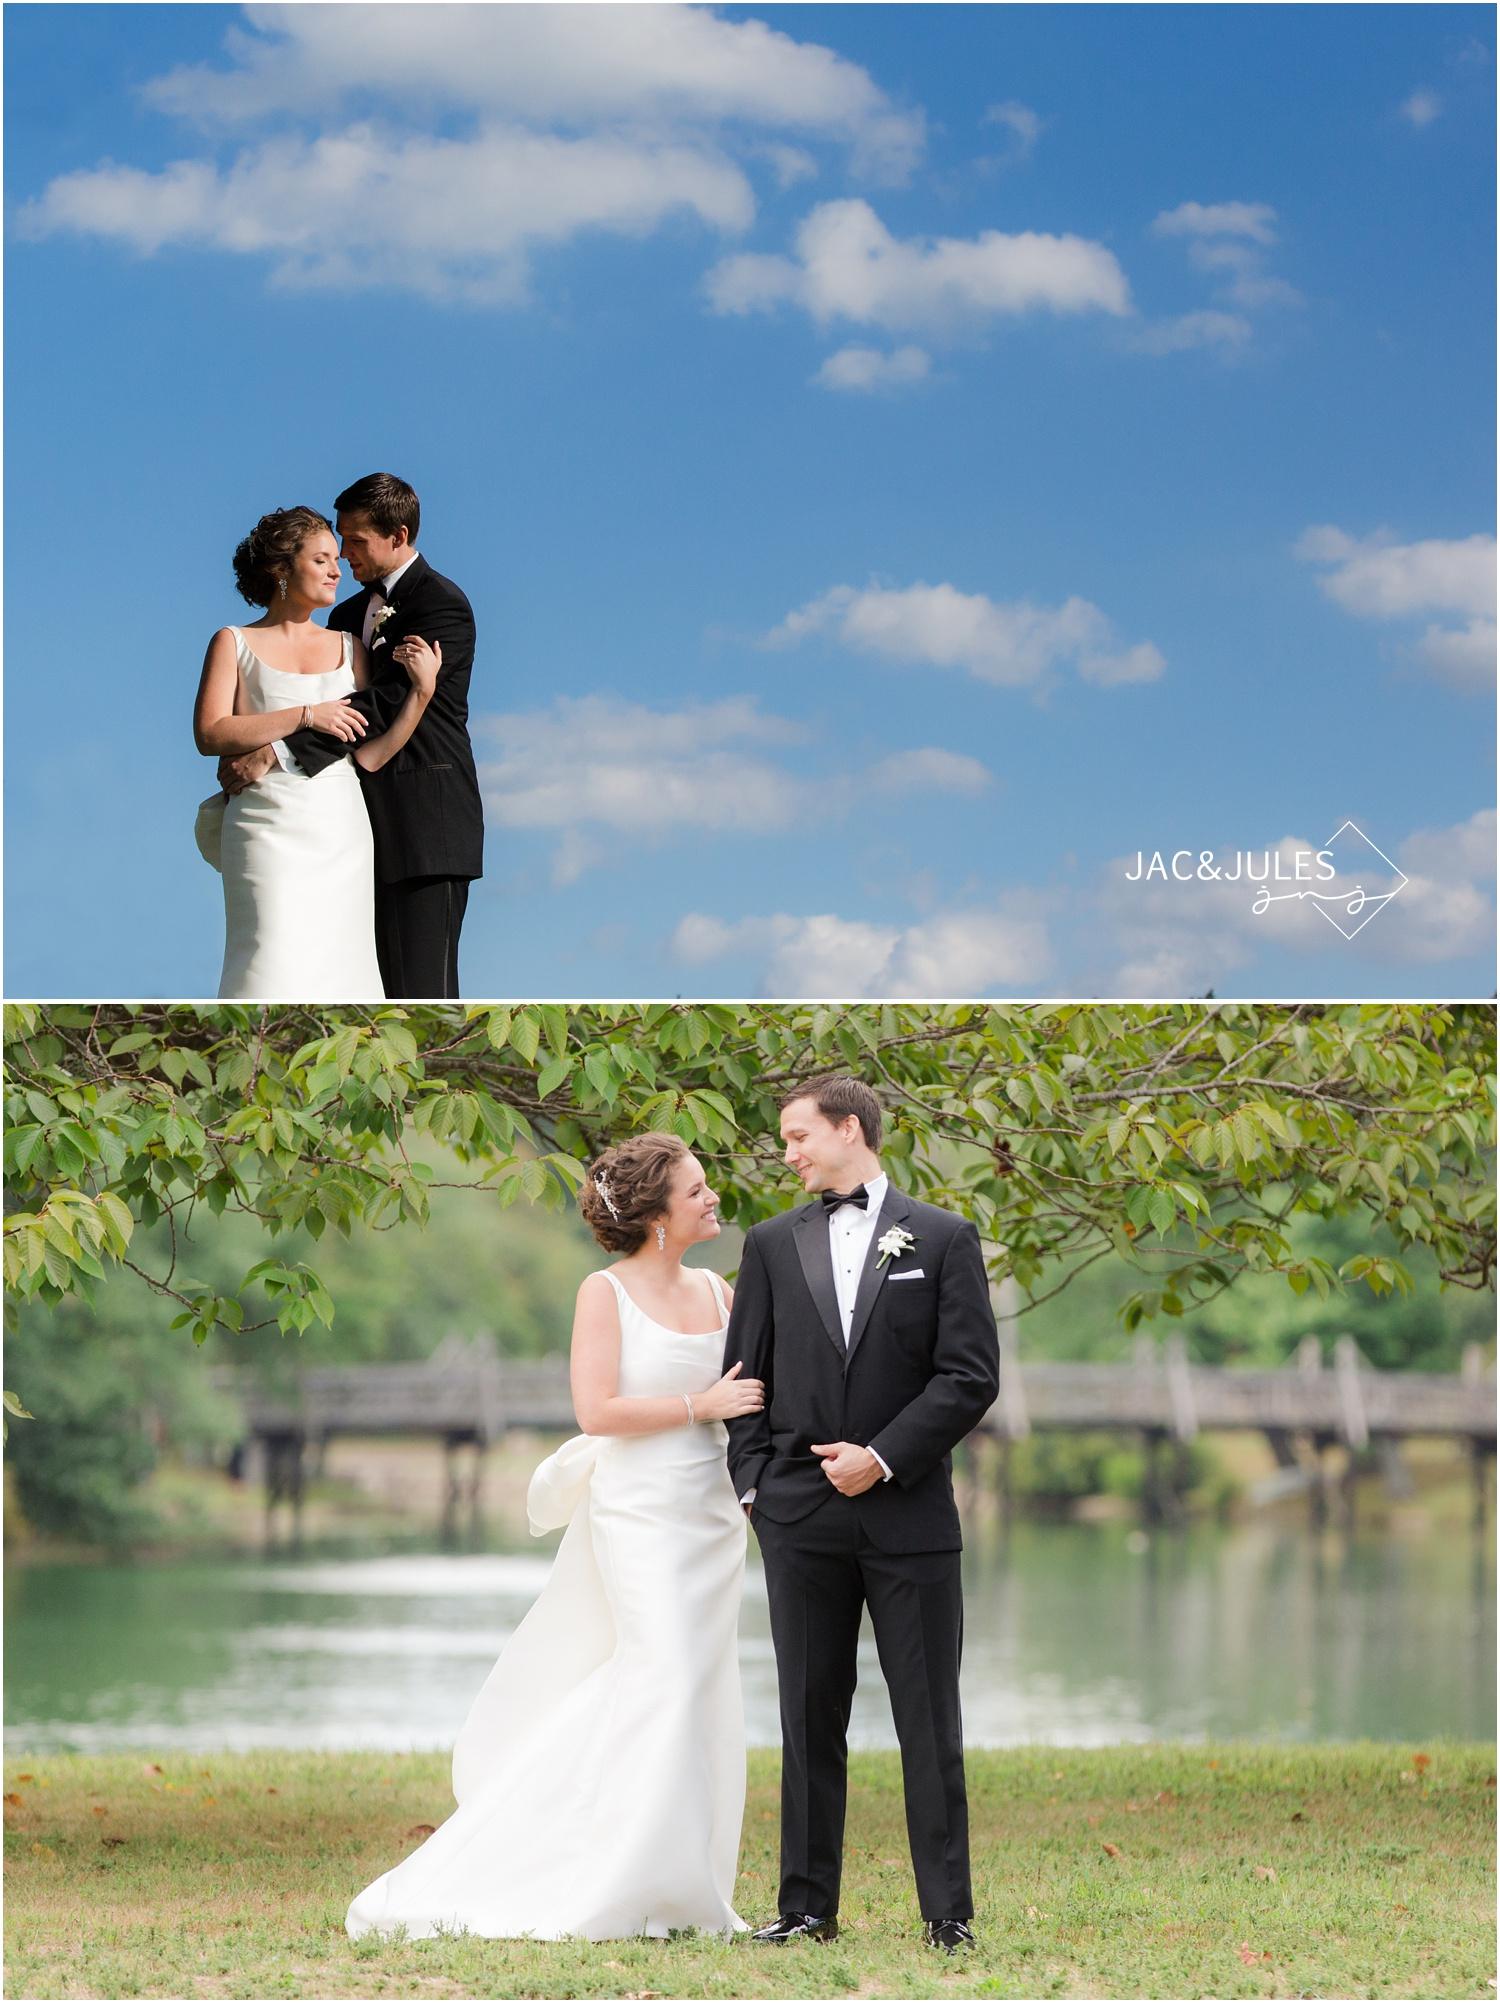 bridal party portraits at divine park in spring lake, nj.